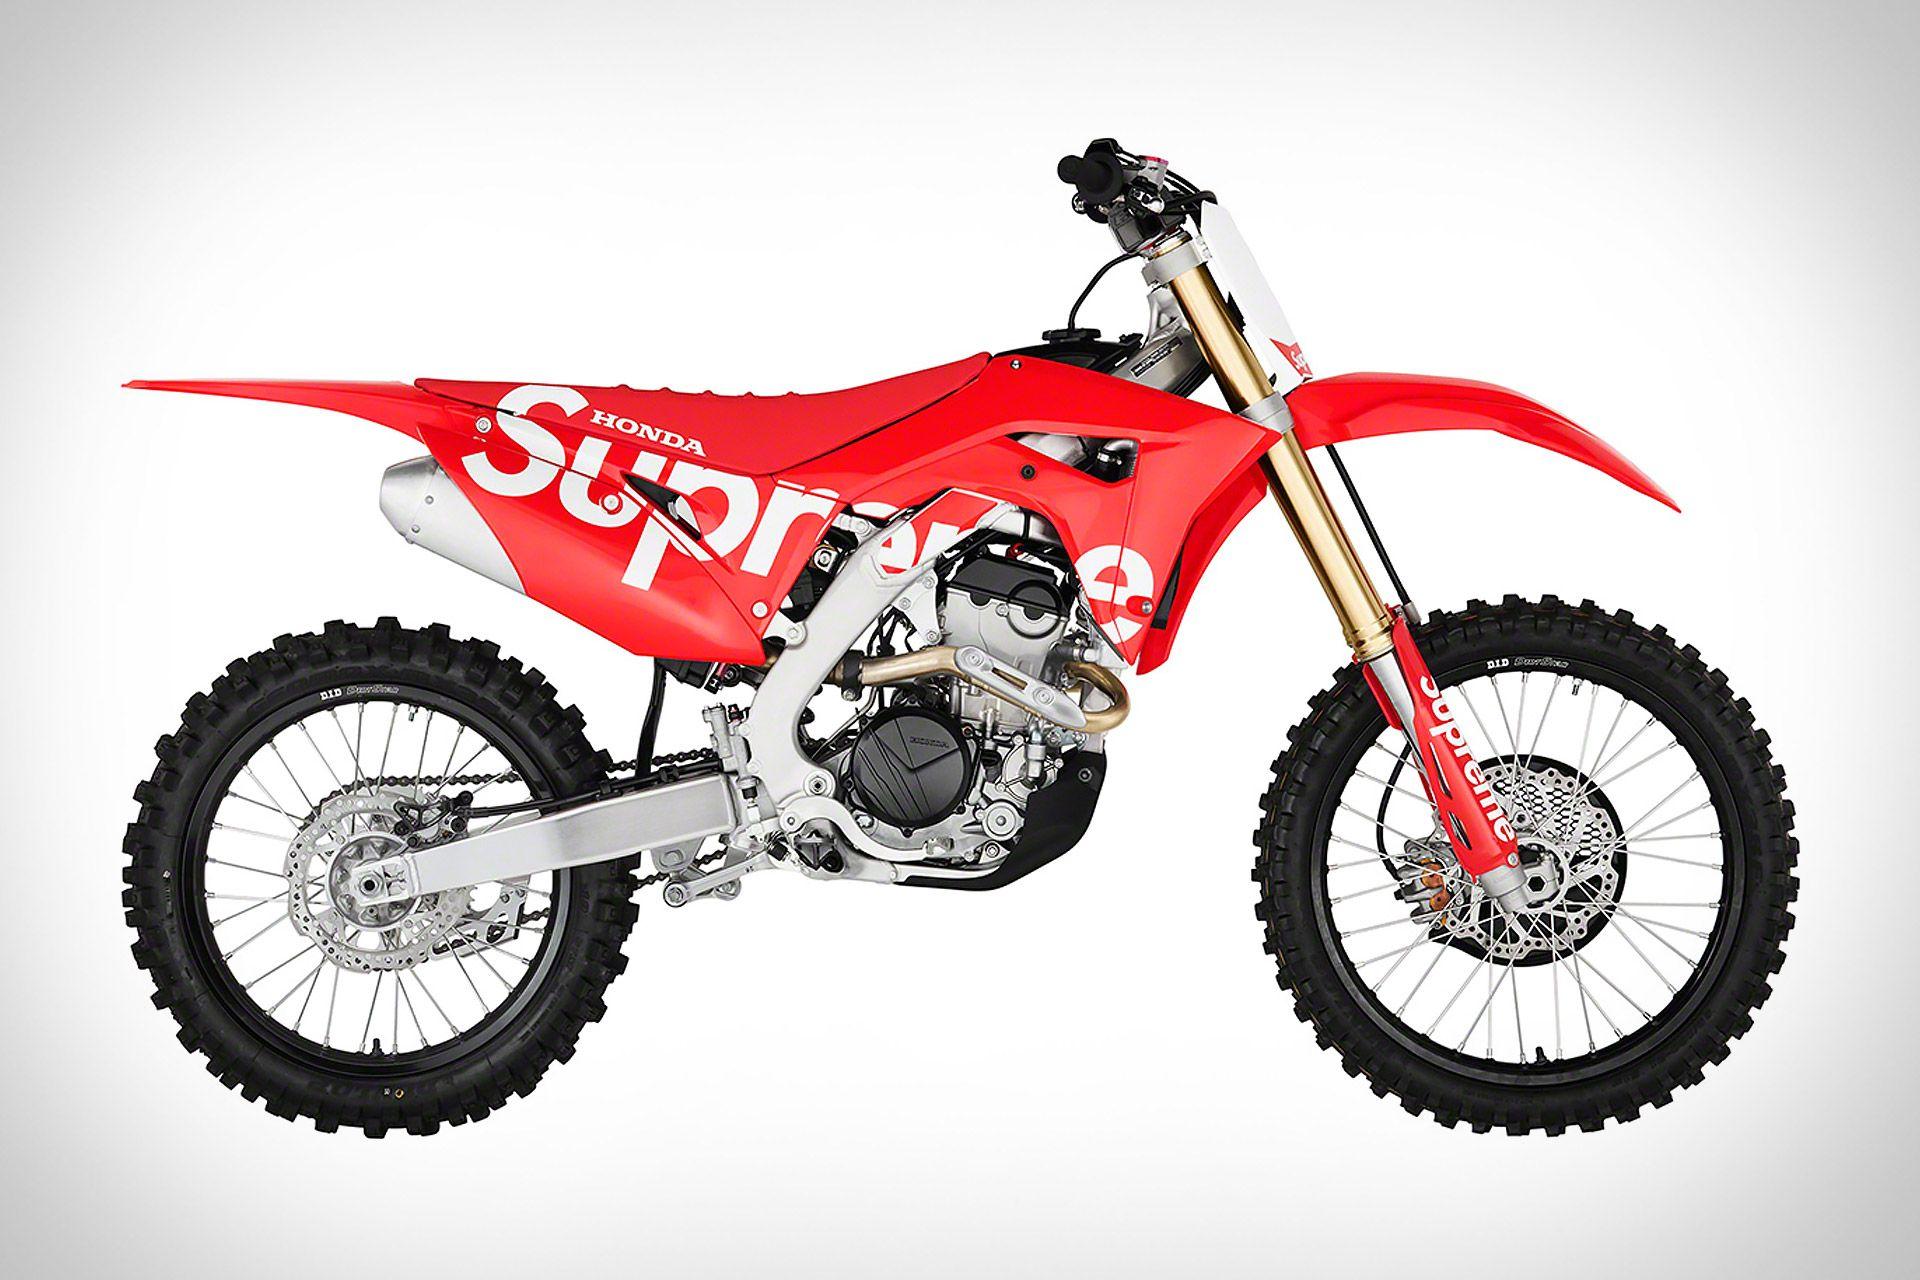 Honda X Supreme Crf 250r Dirt Bike Honda Dirt Bike Dirt Bike Honda